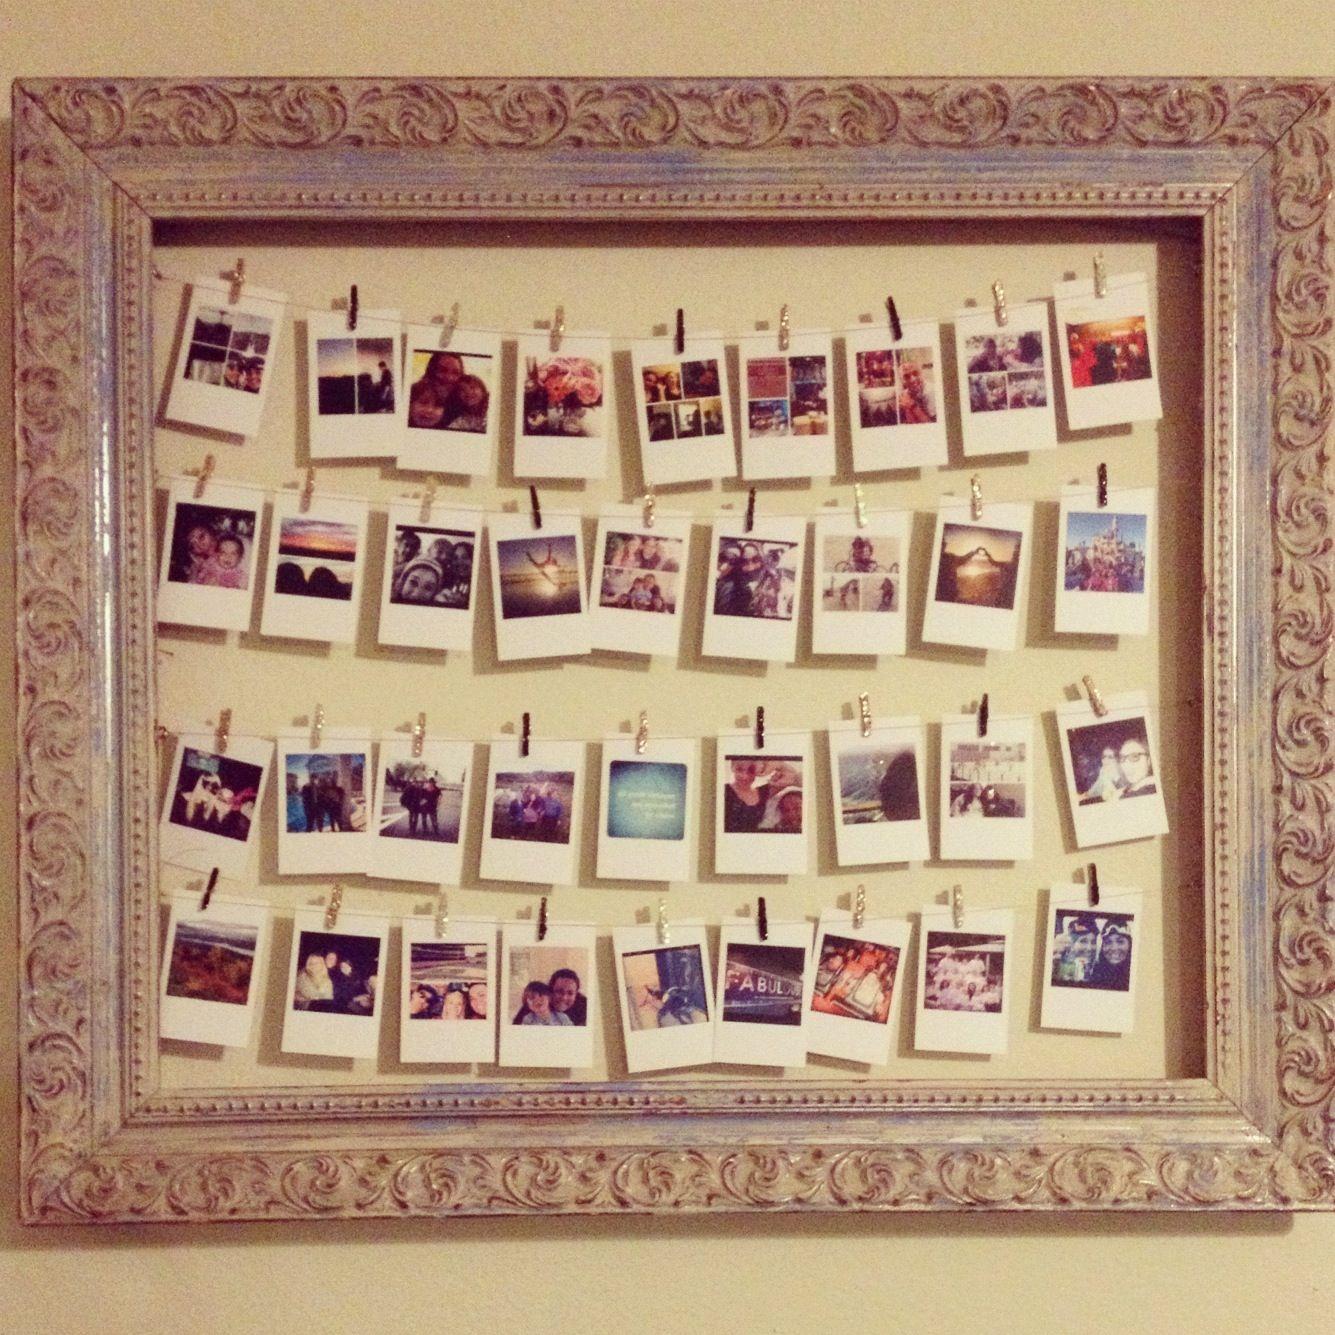 Flea market frame + glitter DIY clothes pins + #prinstagram prints ...